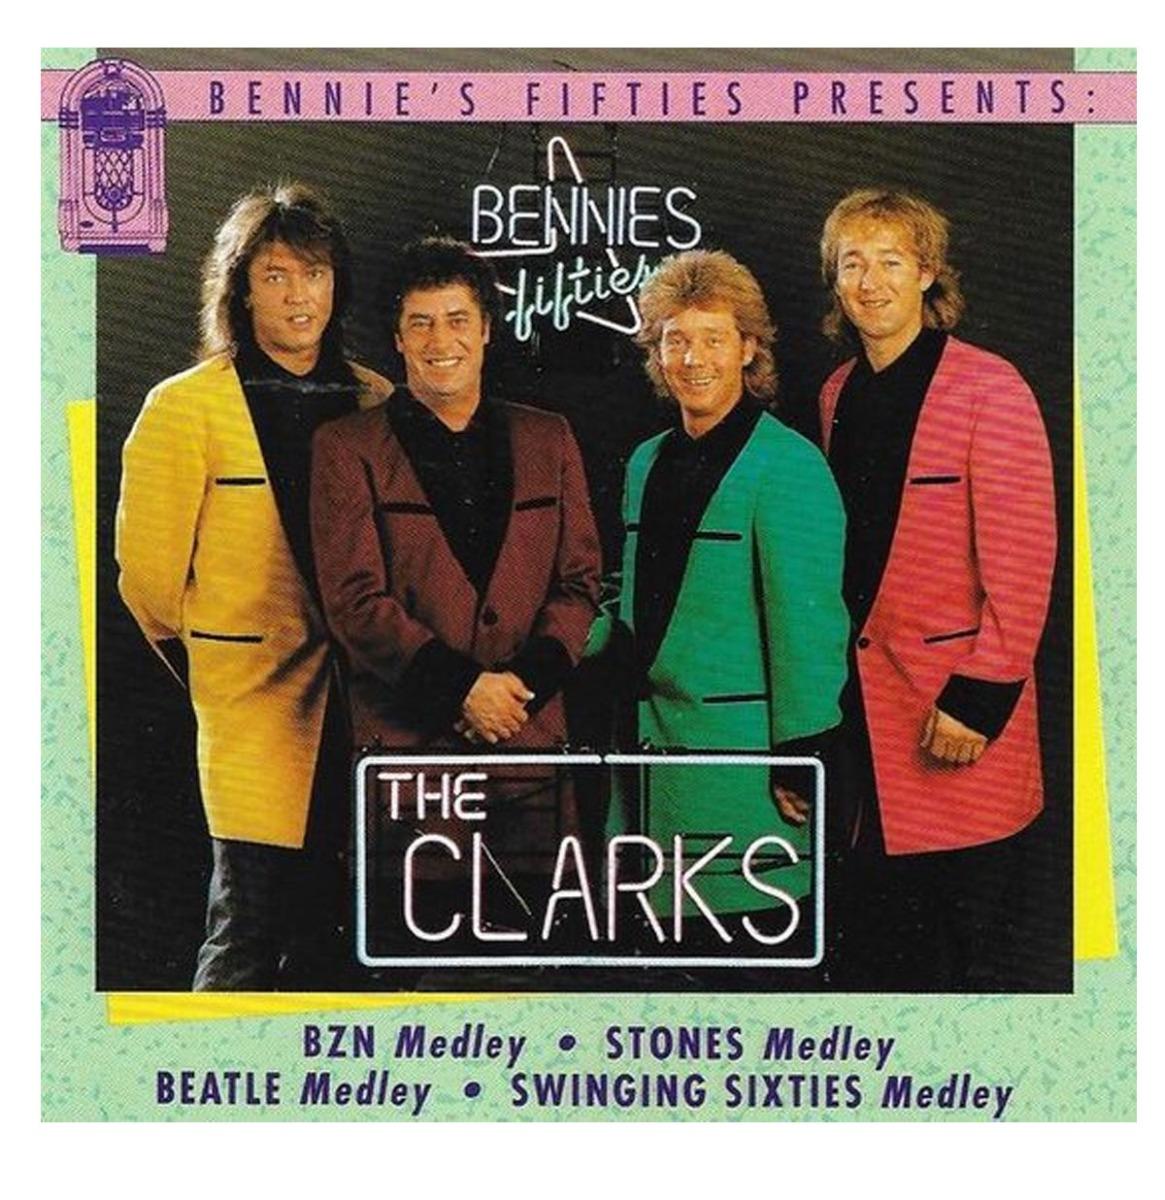 The Clarks - Medleys CD - Bennies Fifties Presents